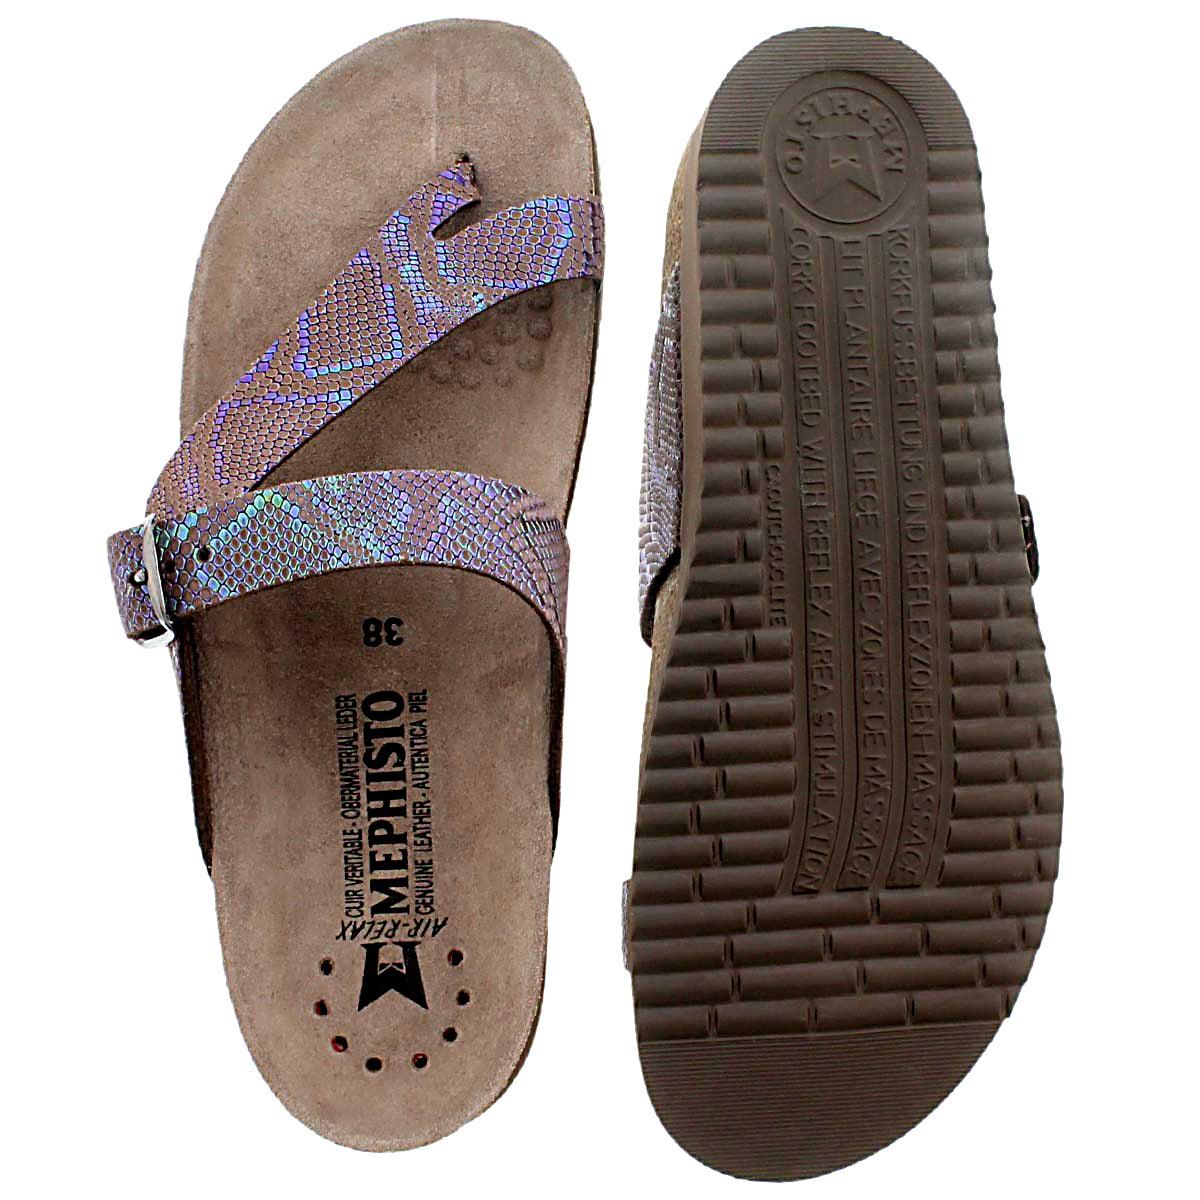 Lds Helen dk brown cork footbed thong